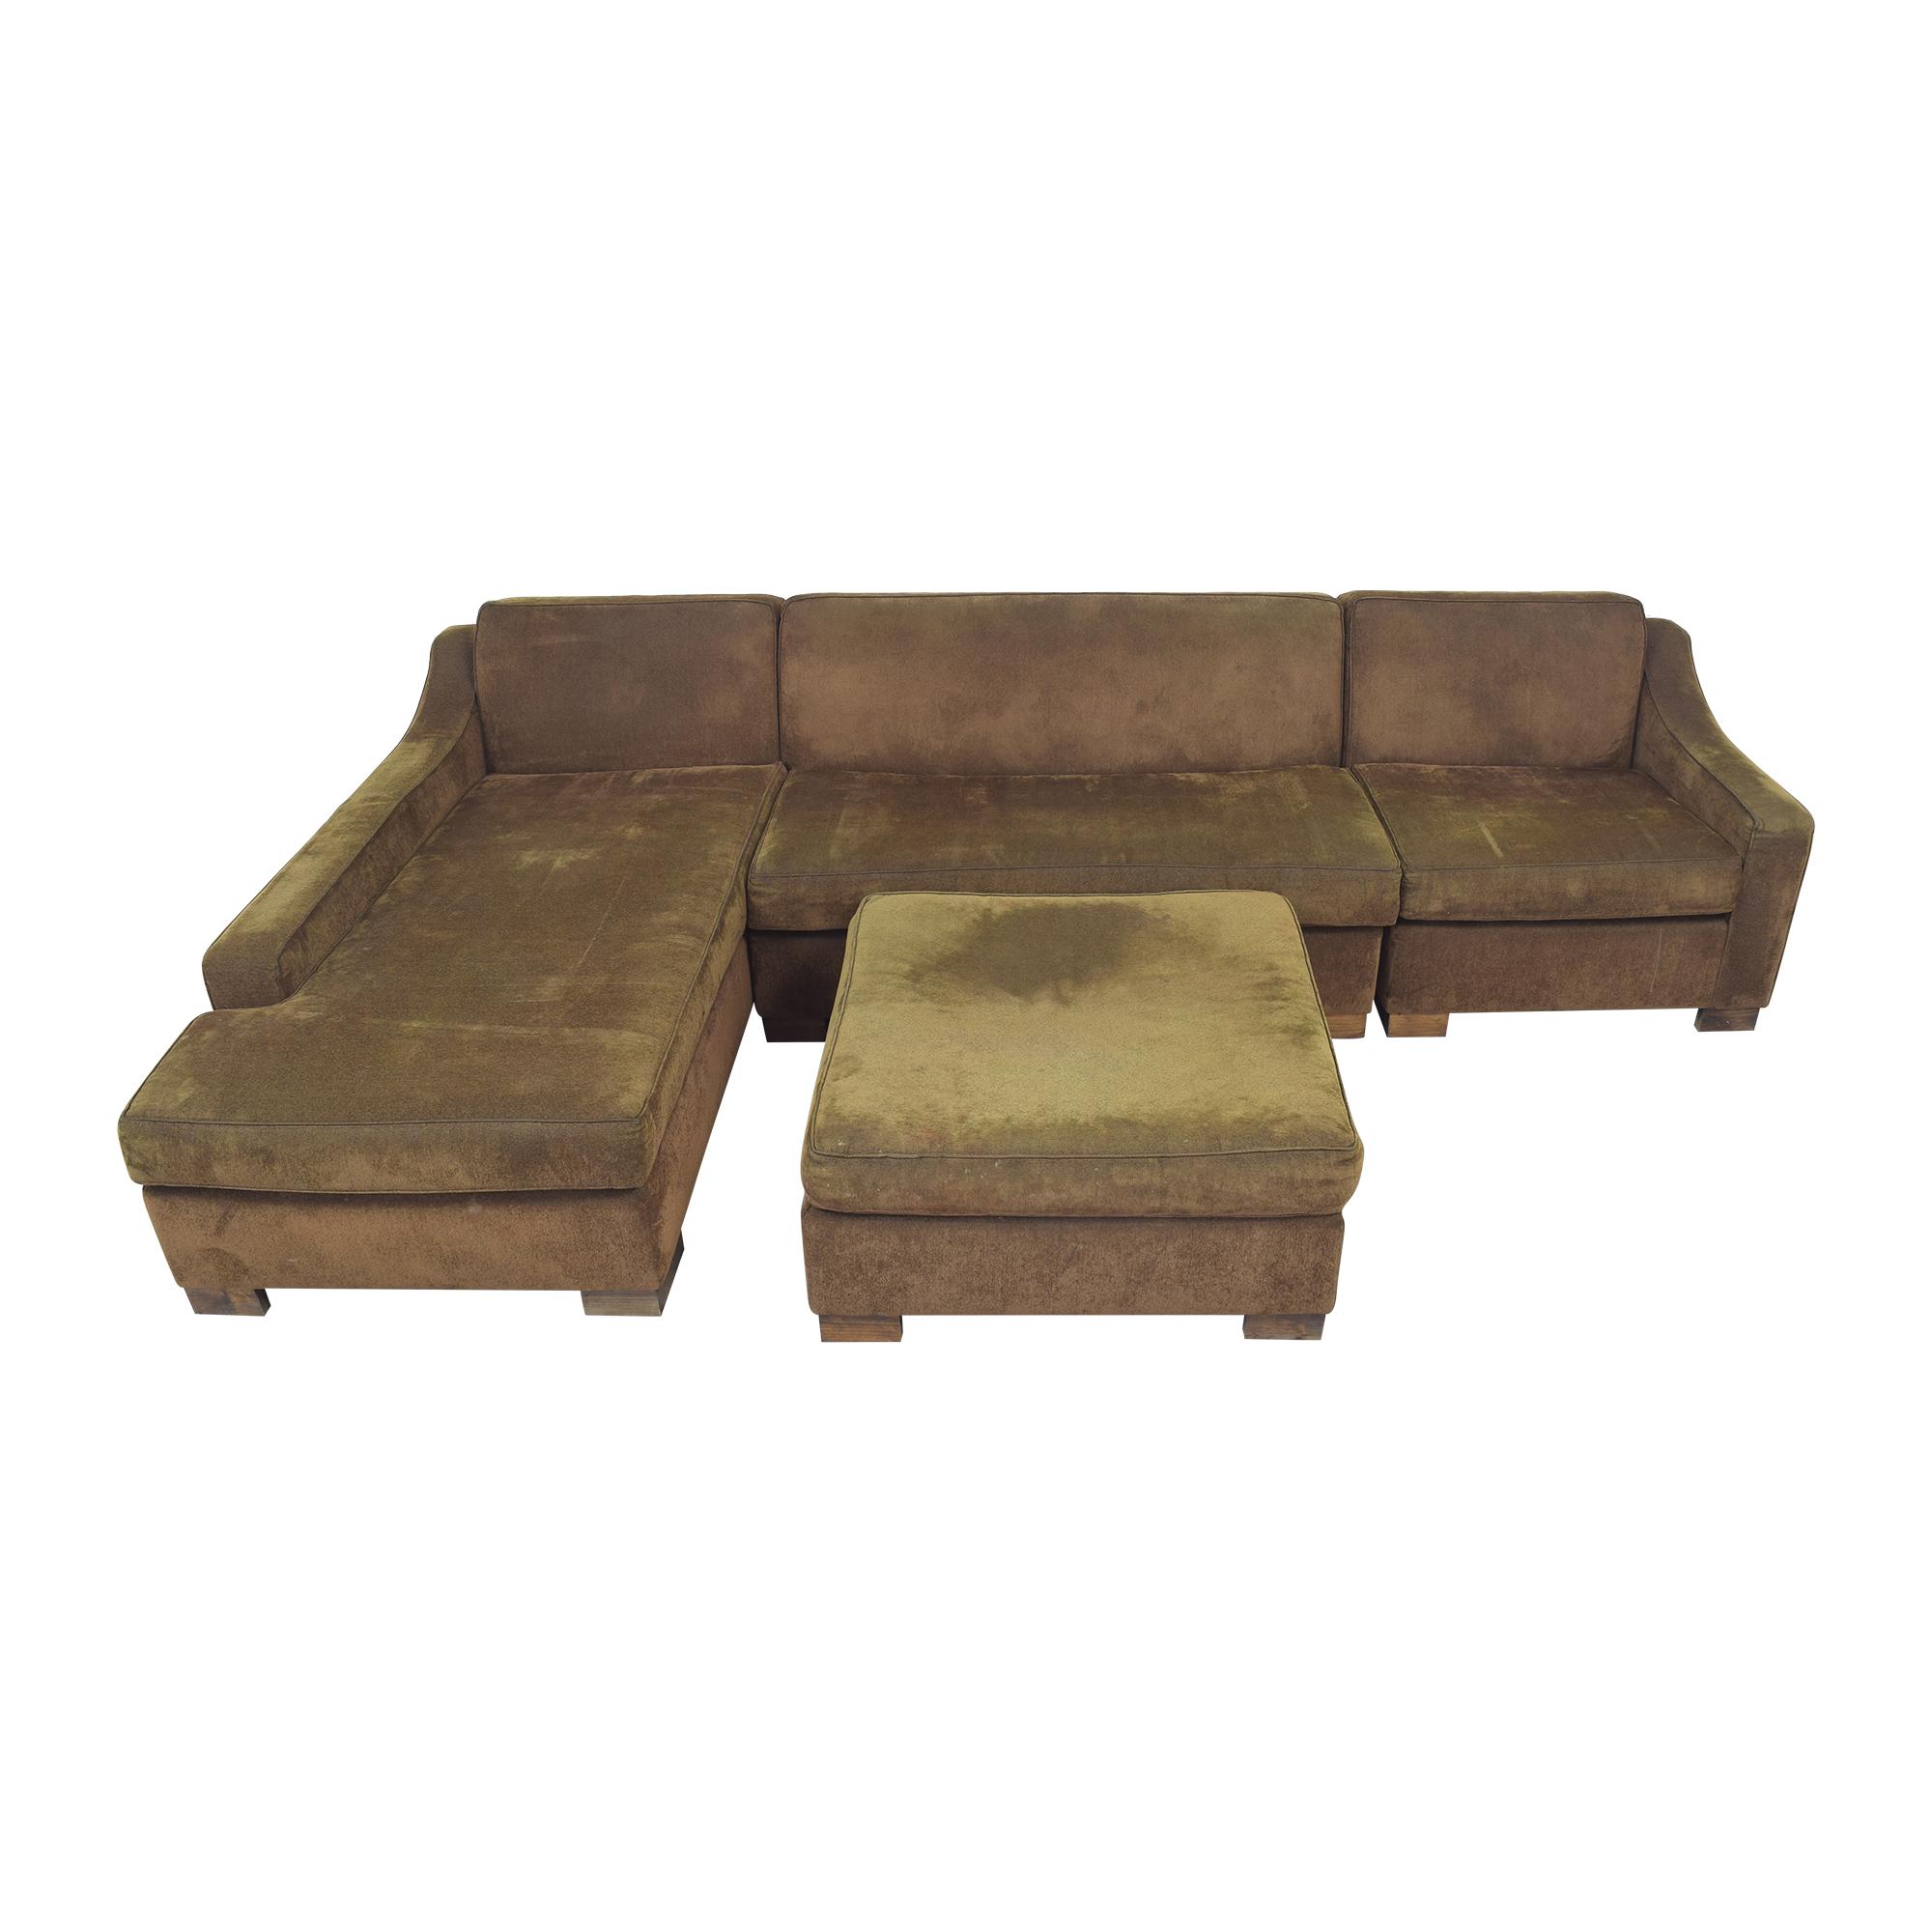 Custom Chaise Sectional Sofa with Ottoman coupon